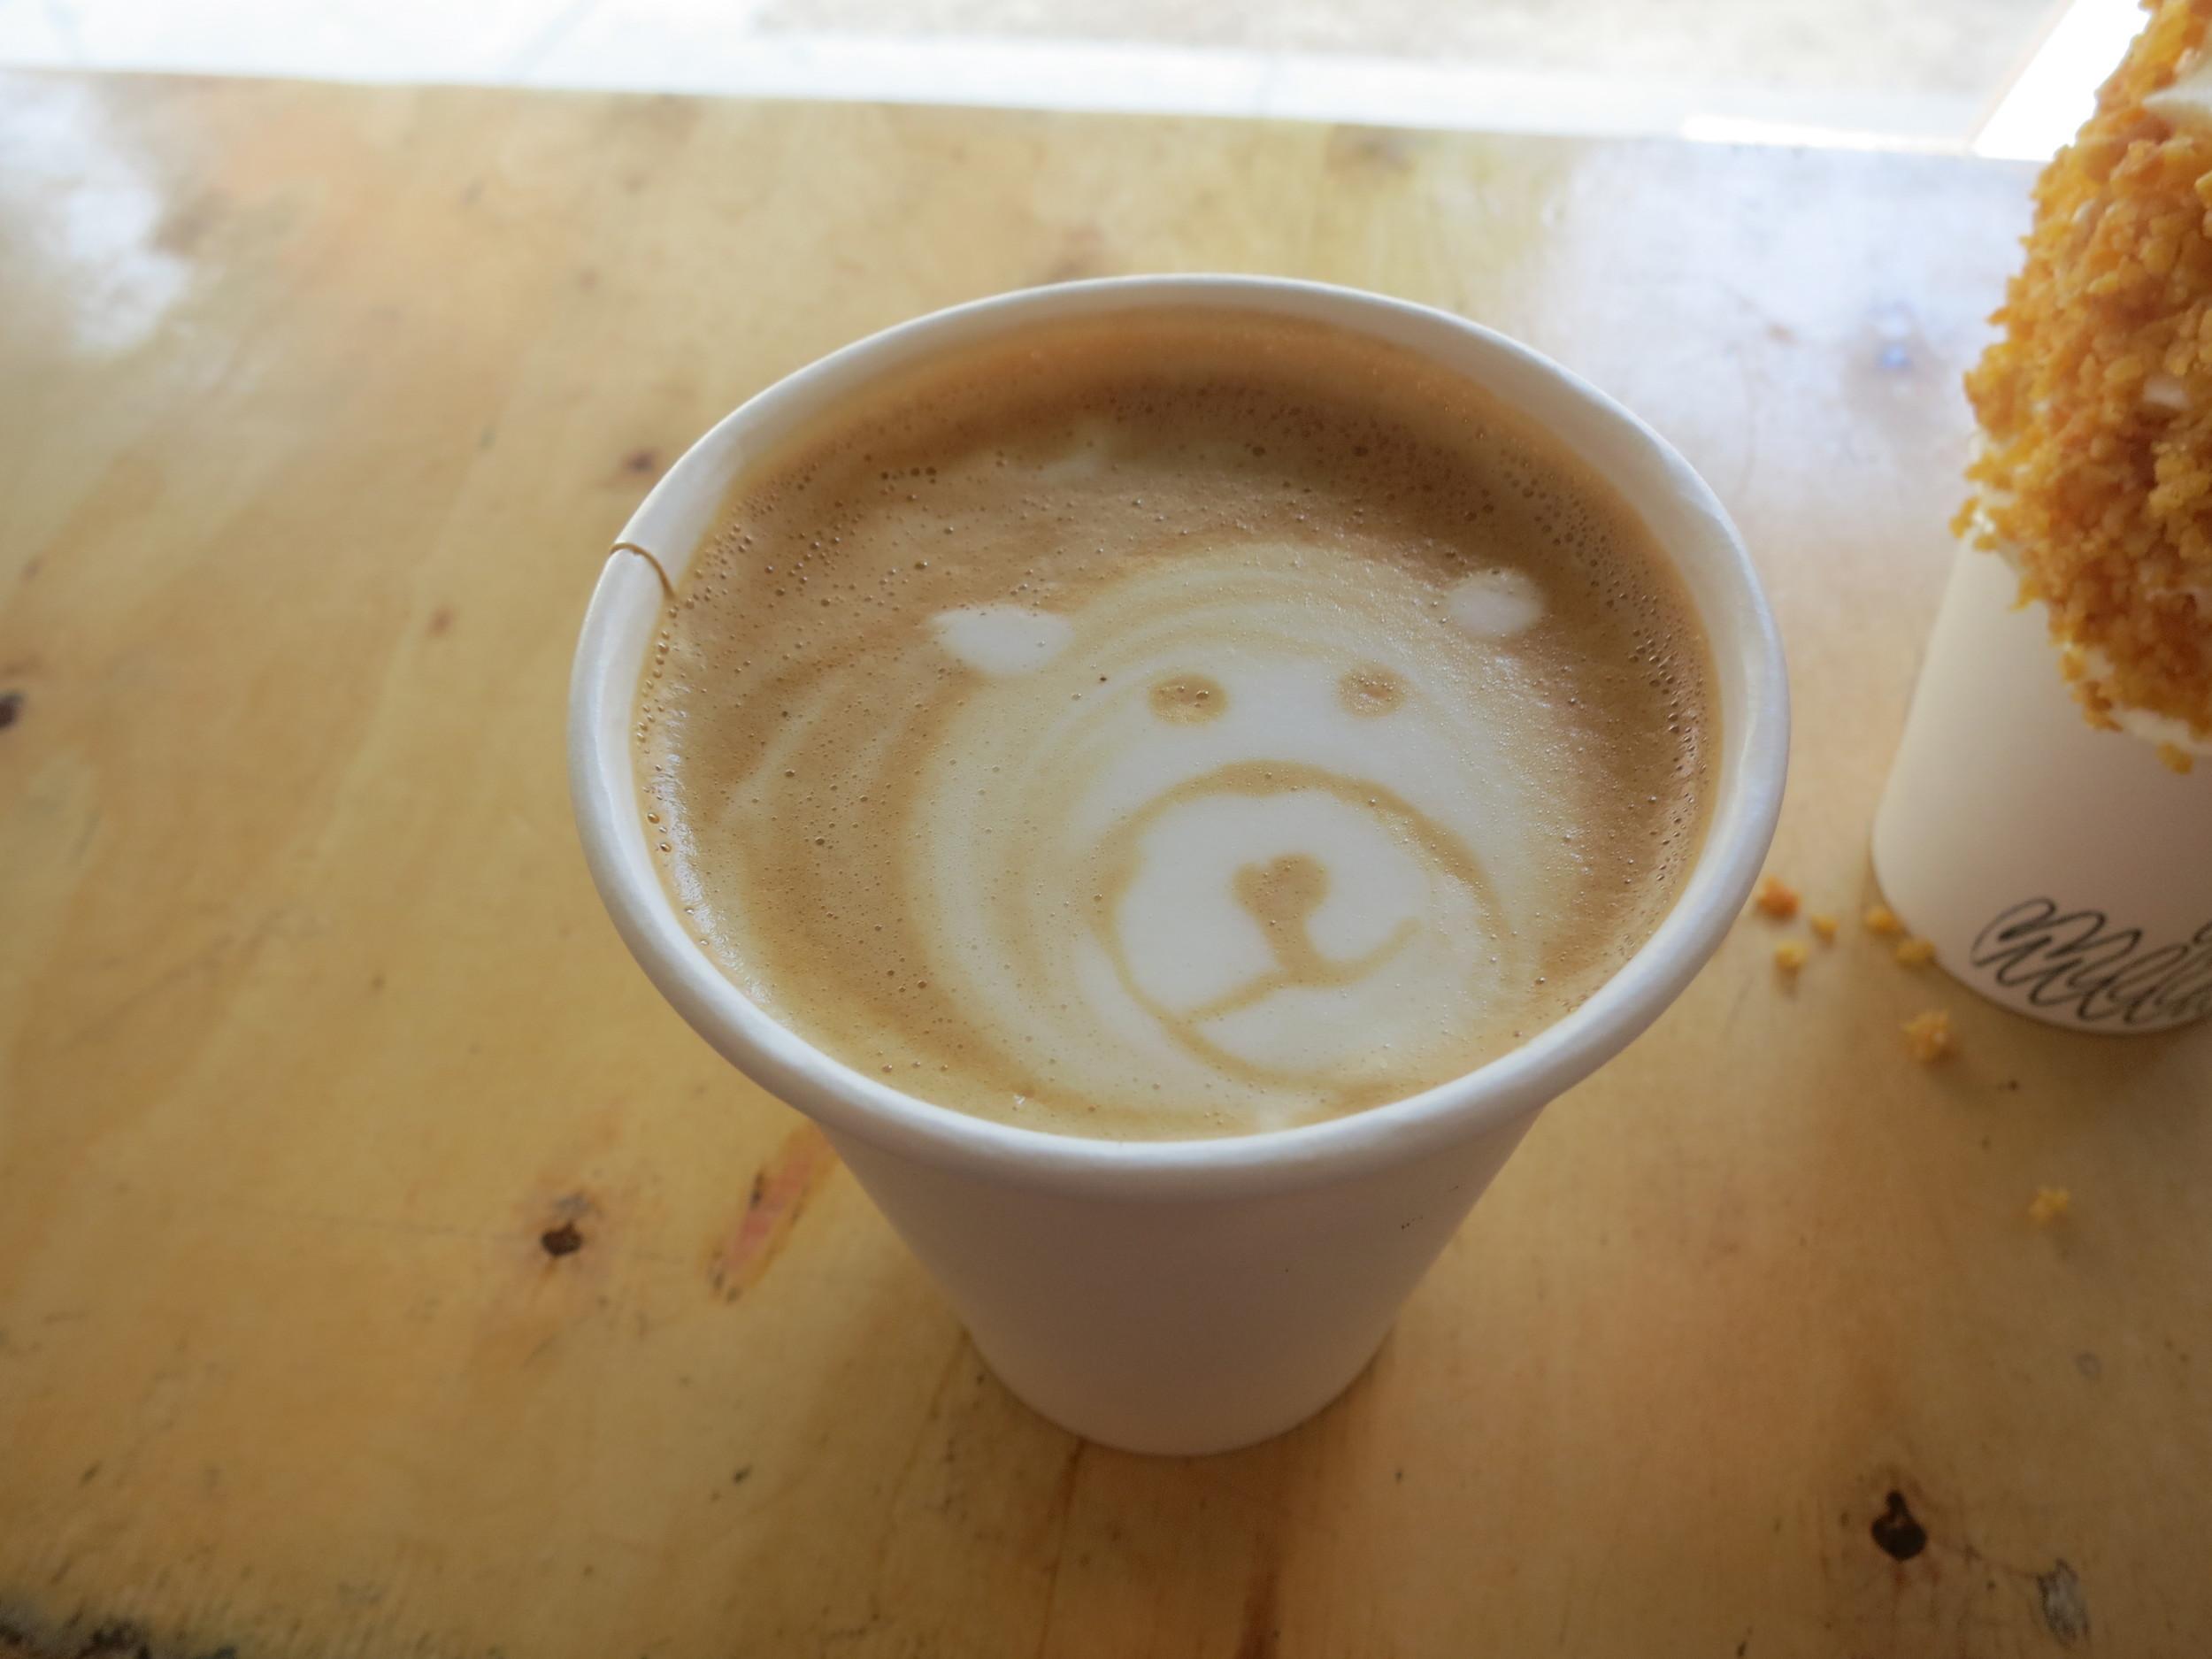 Joyride Coffee, Cappuccino